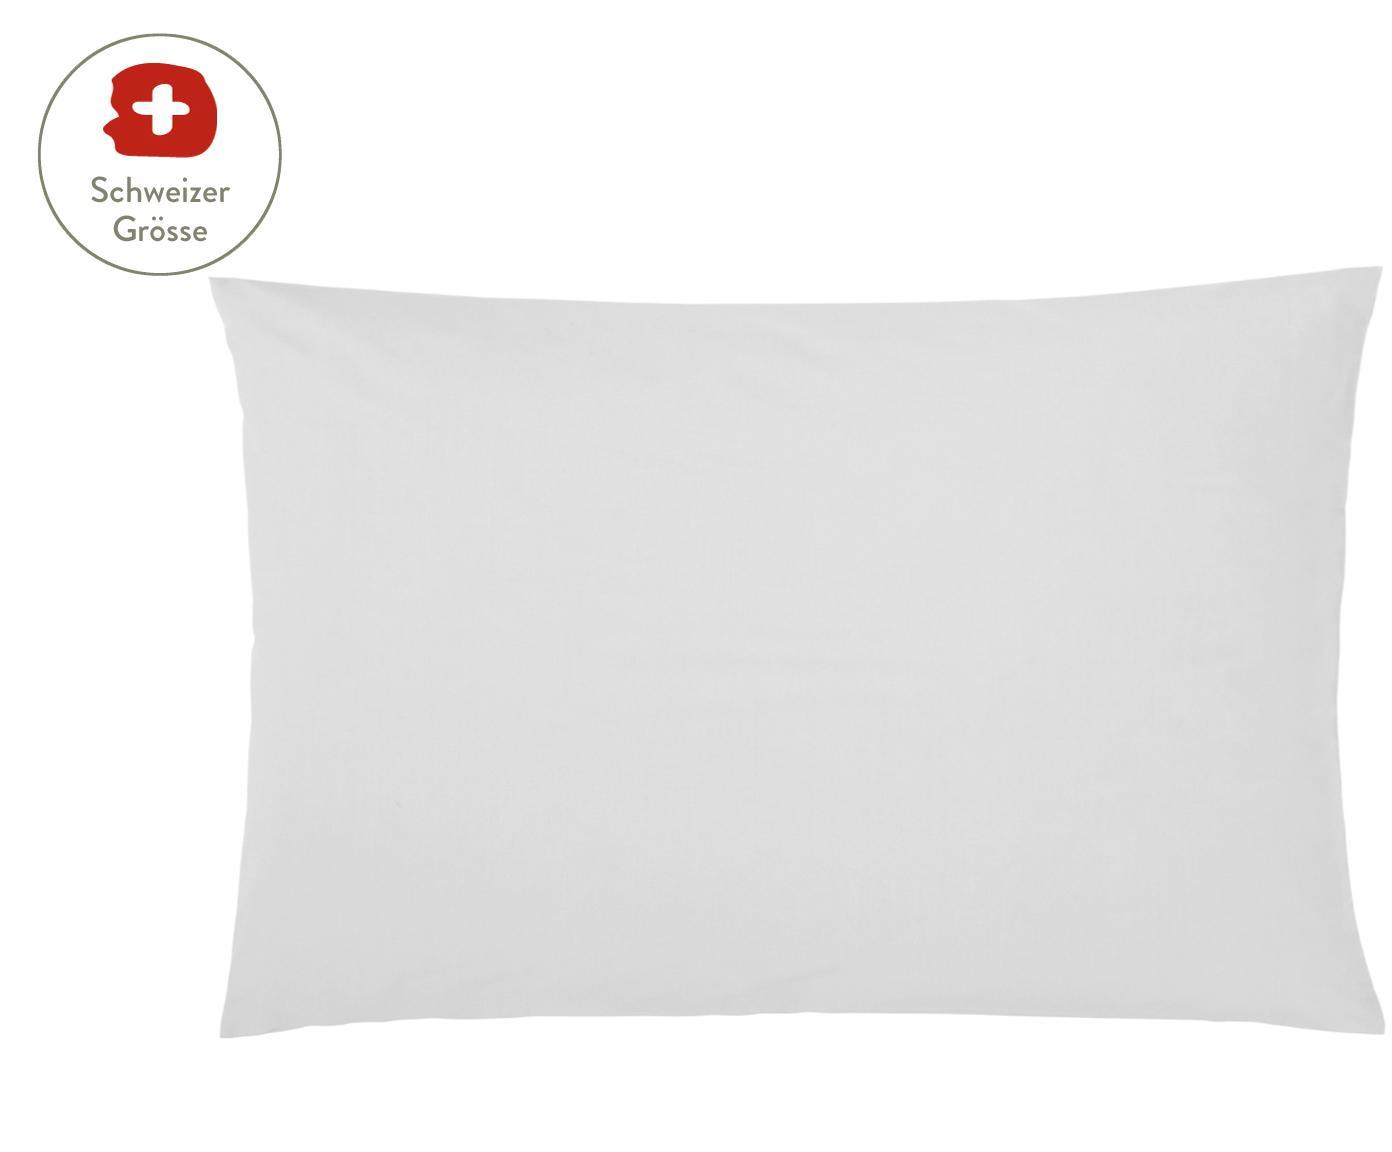 Baumwollperkal-Kissenbezug Elsie in Hellgrau, Webart: Perkal Fadendichte 200 TC, Hellgrau, 65 x 100 cm